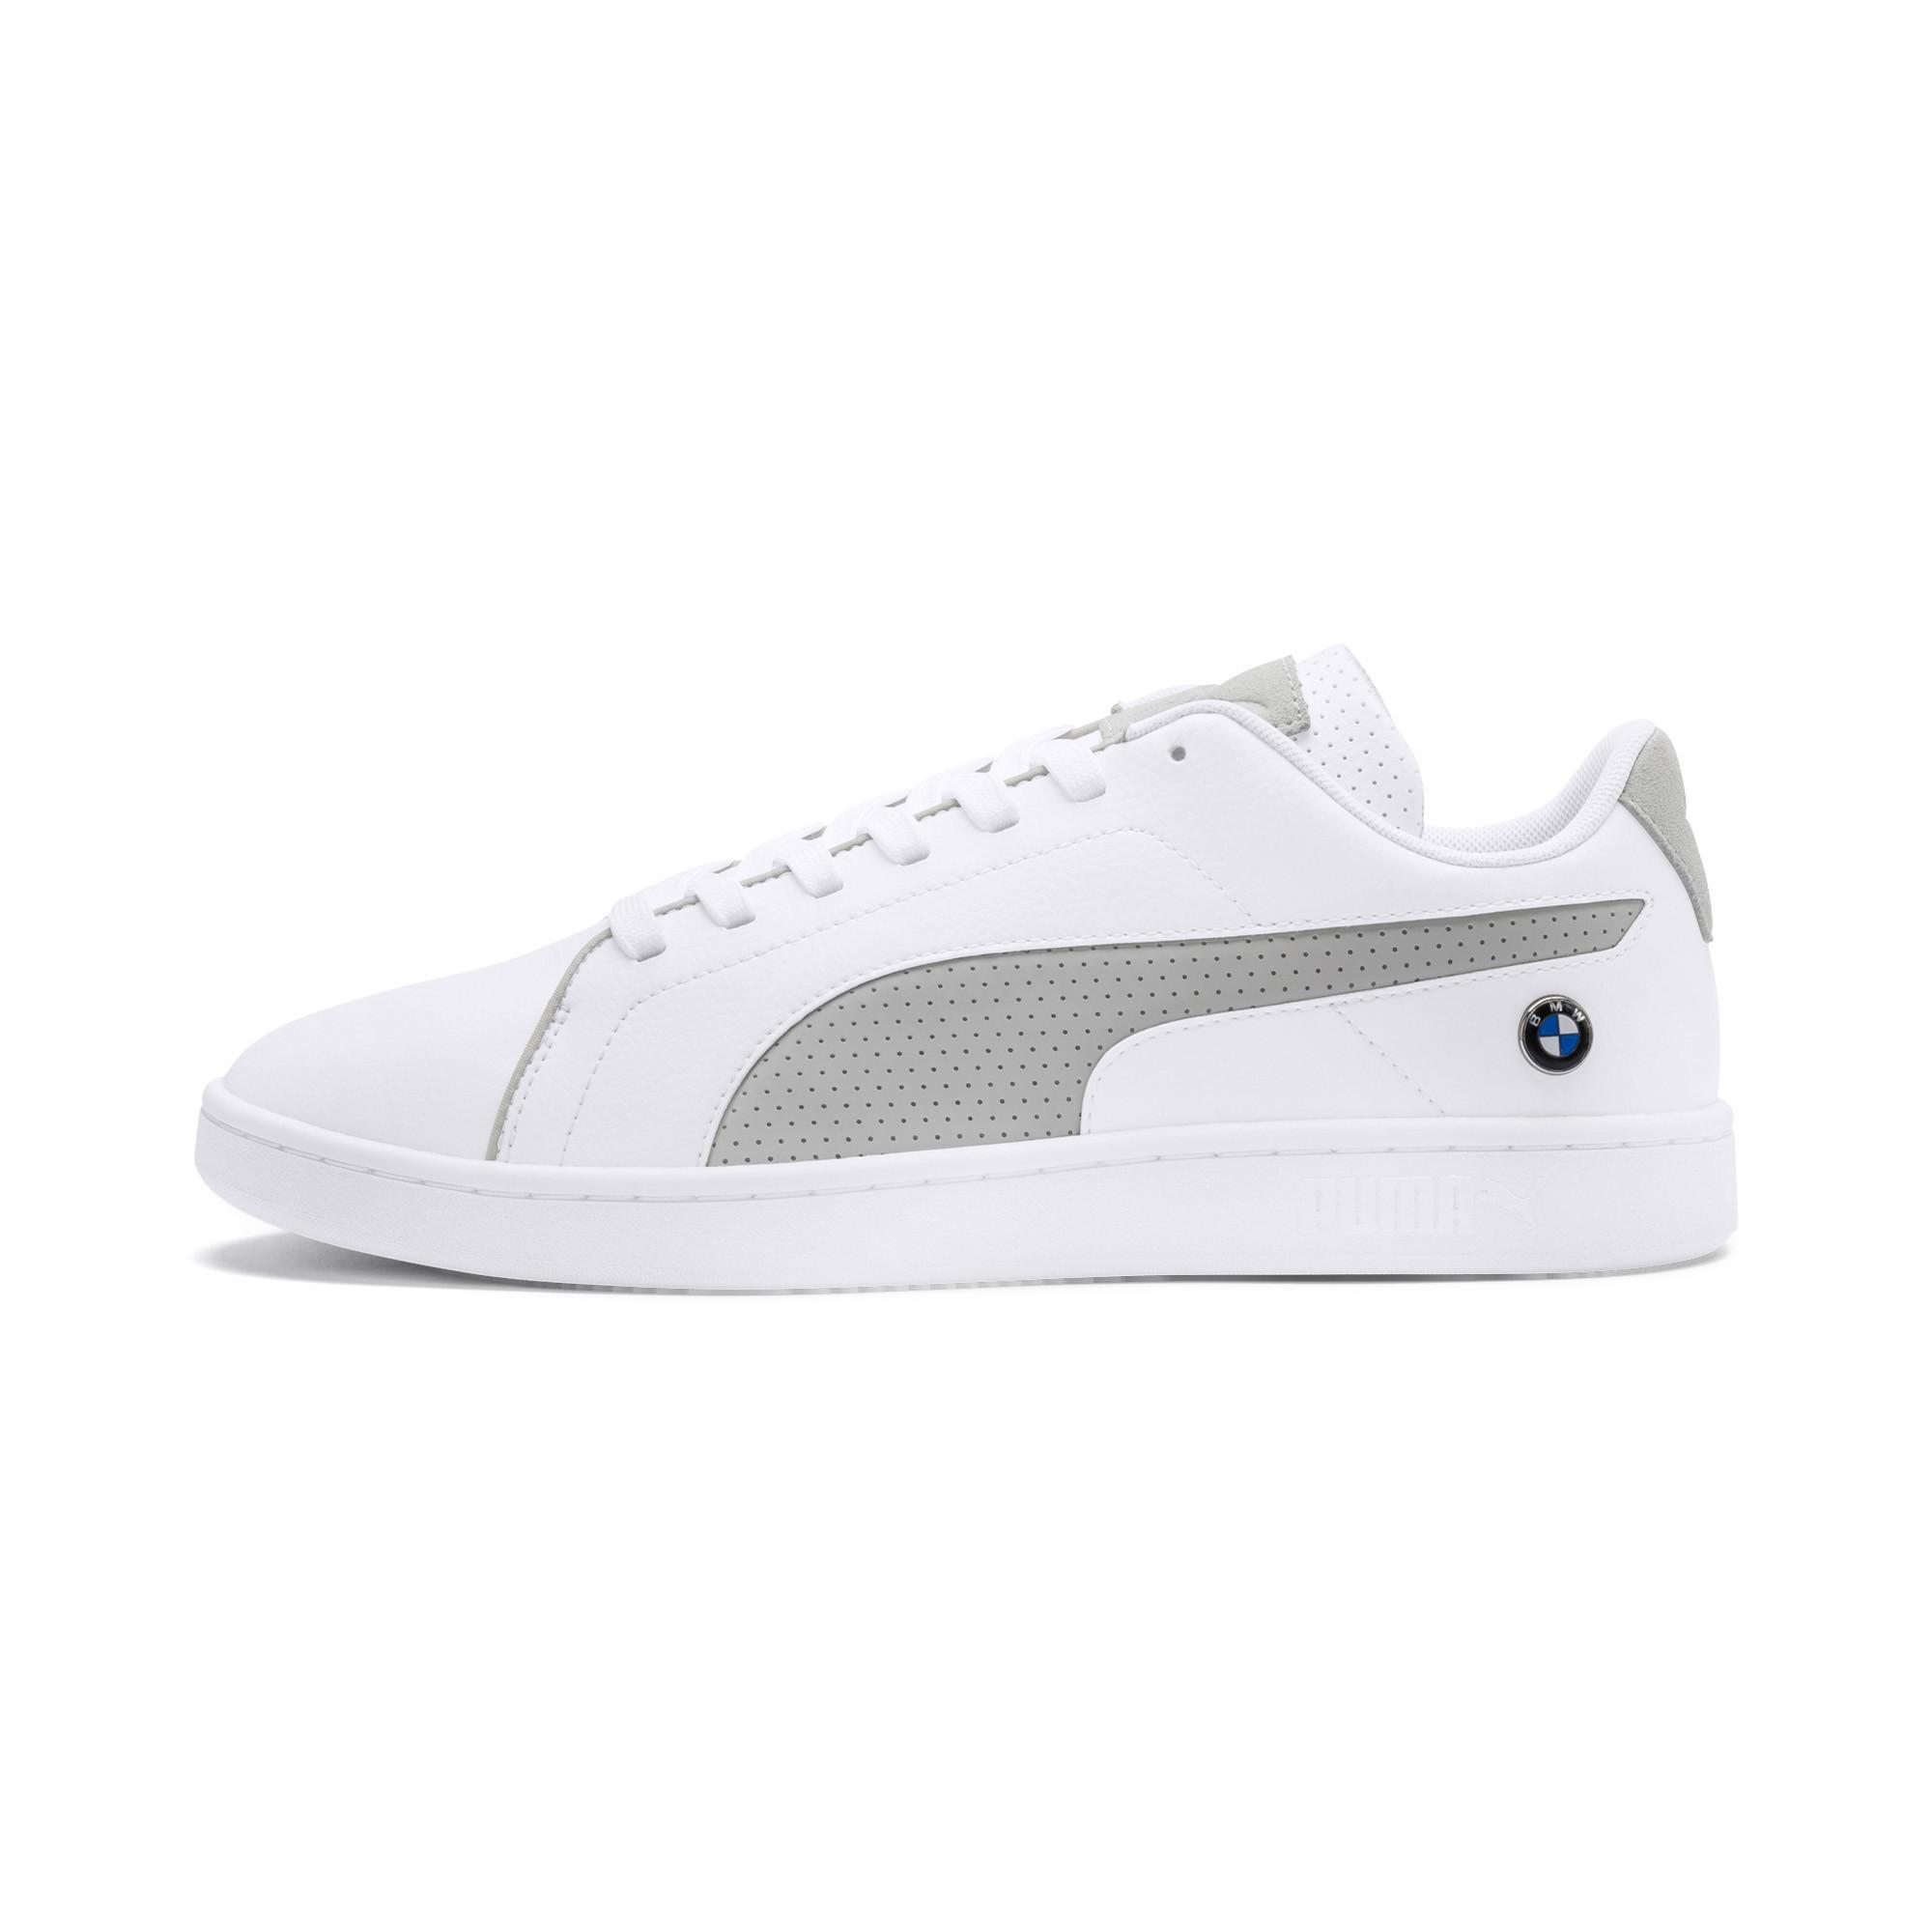 Lyst - PUMA Bmw Mms Smash V2 in White for Men 977051c95